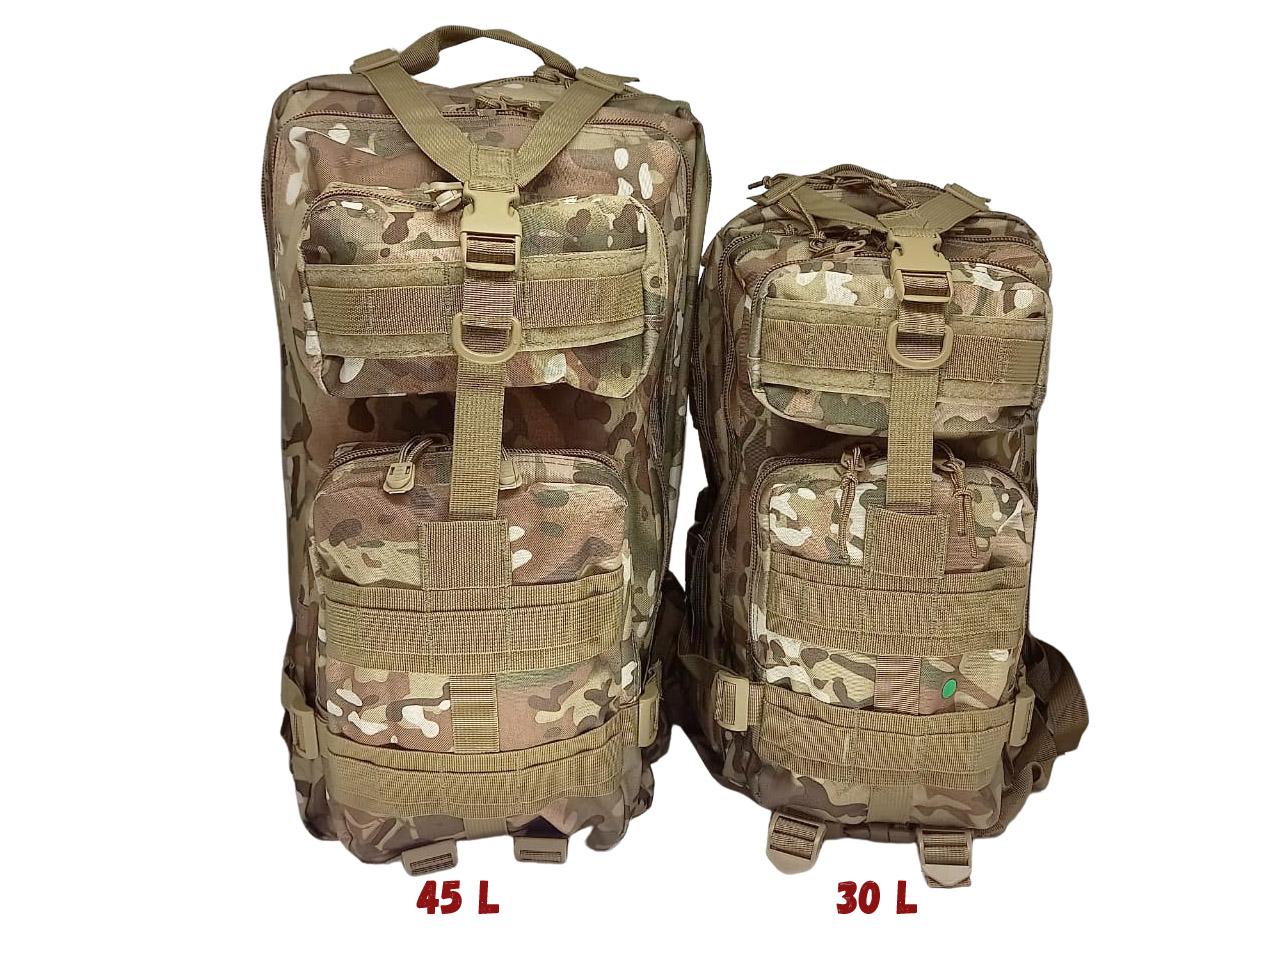 Mochila Tatica Militar Cordura 30 L - Cor: Preta  - MAB AIRSOFT